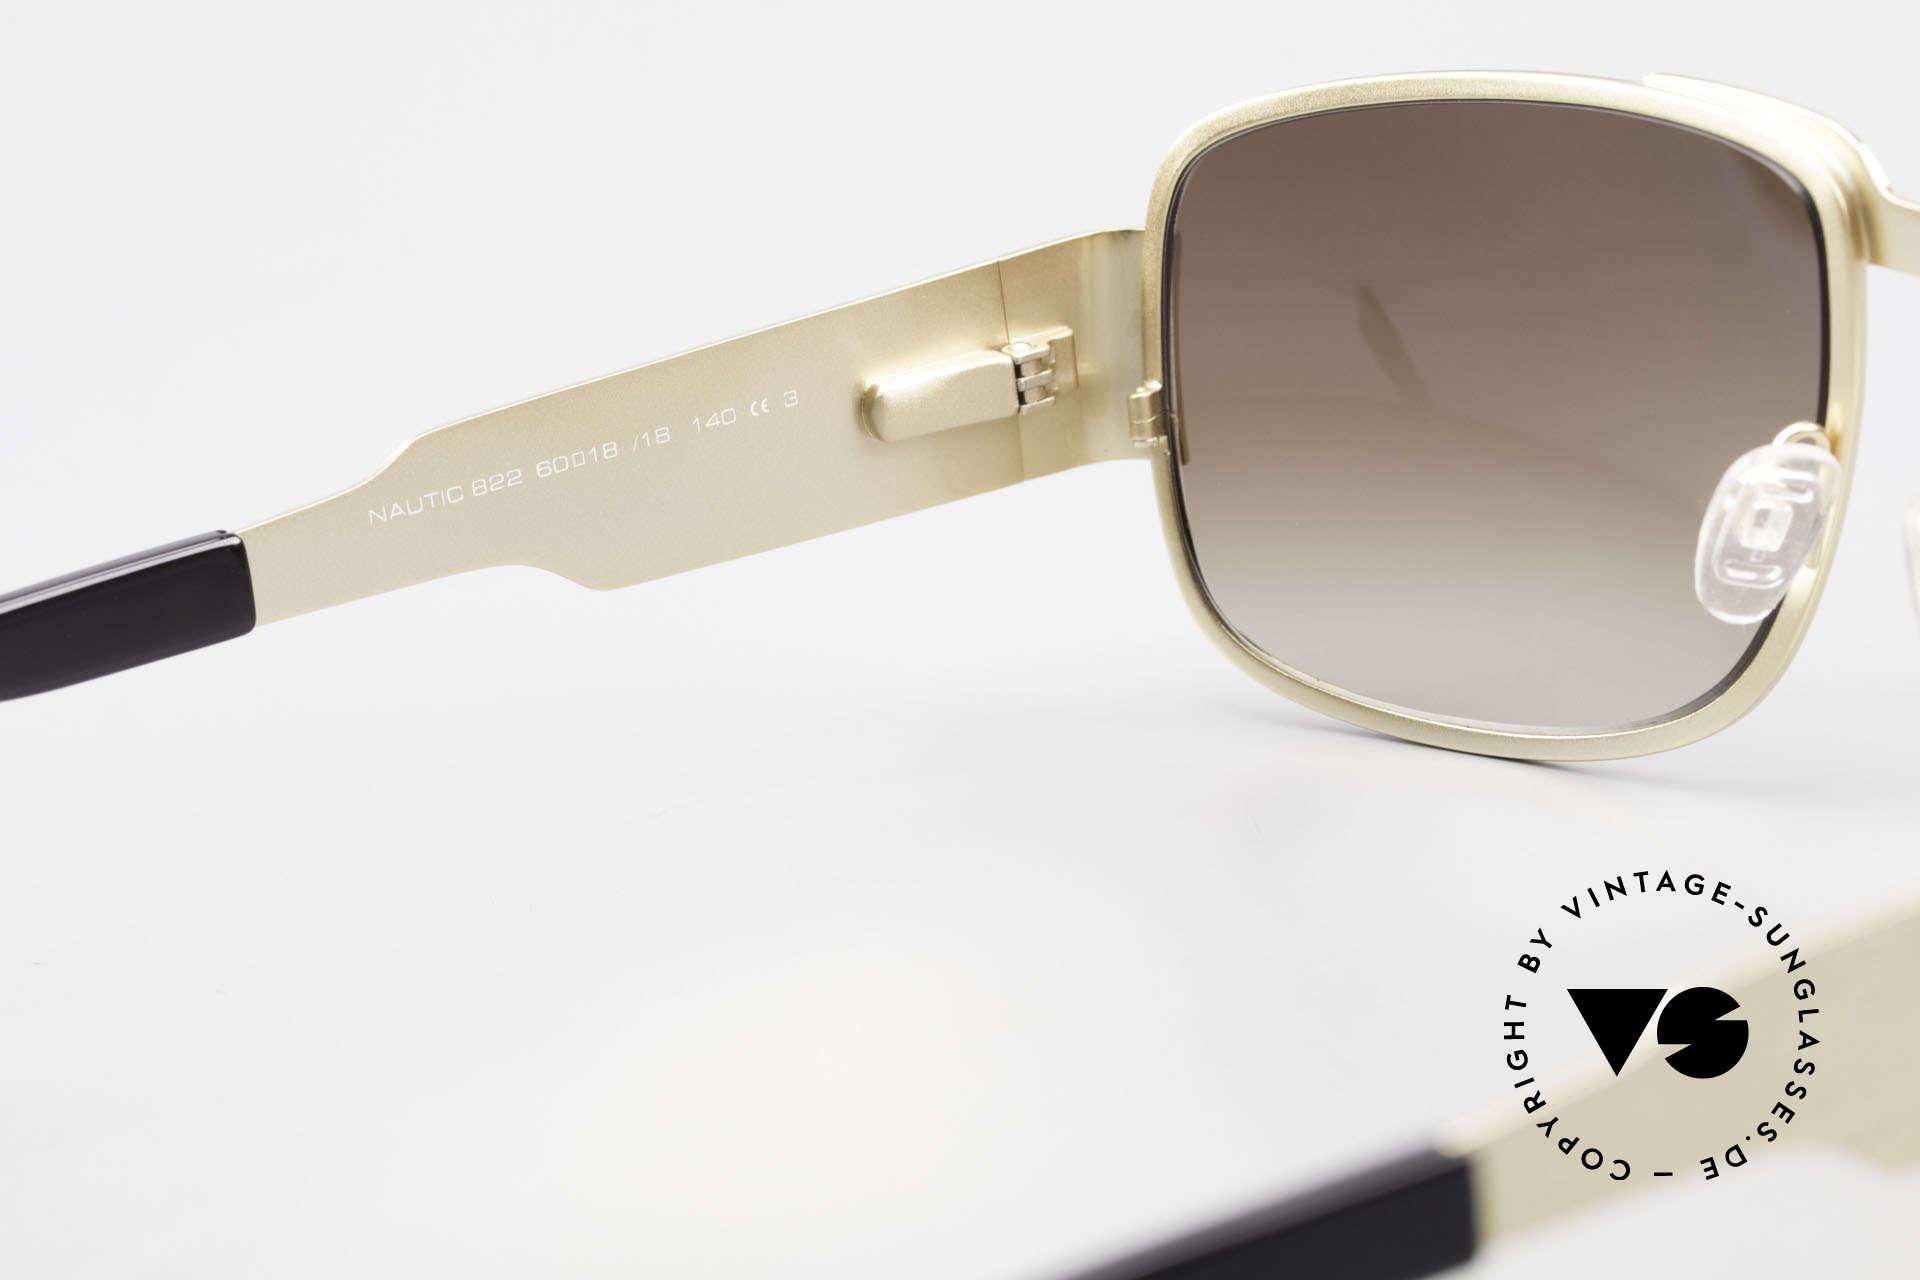 Neostyle Nautic 2 Brad Pitt Tarantino Sunglasses, Size: extra large, Made for Men